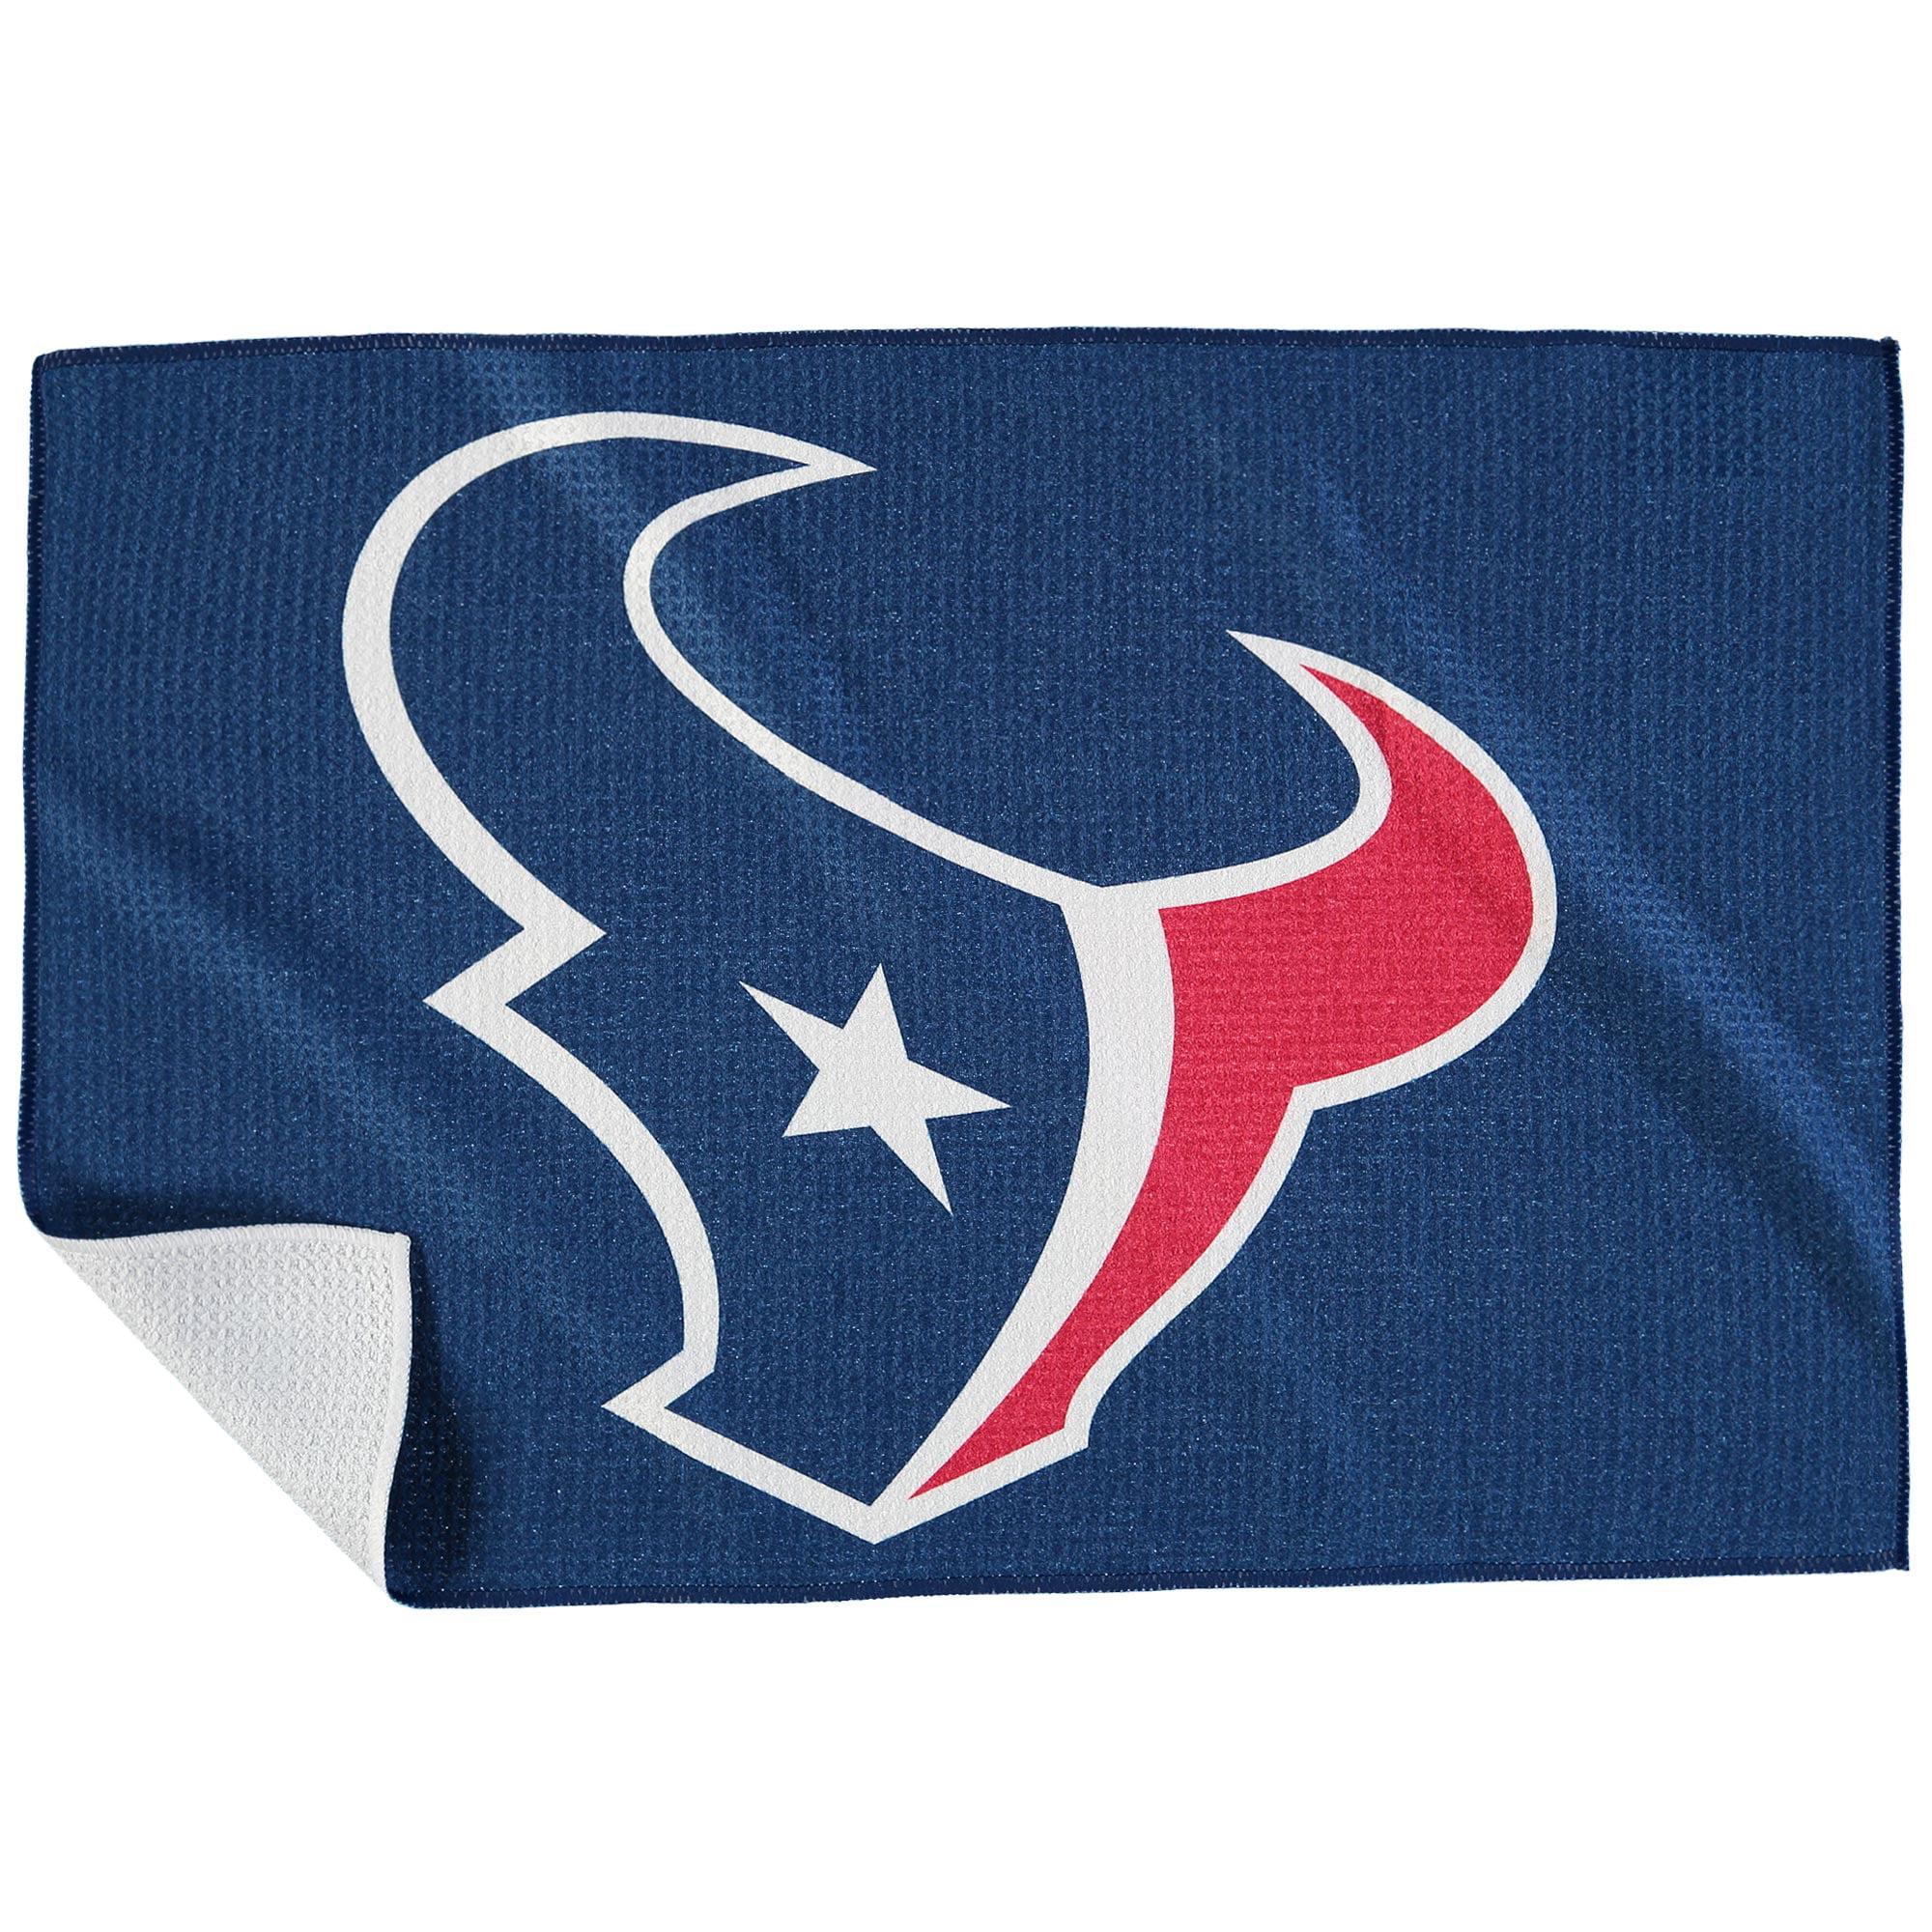 "Houston Texans 16"" x 24"" Microfiber Towel - No Size"